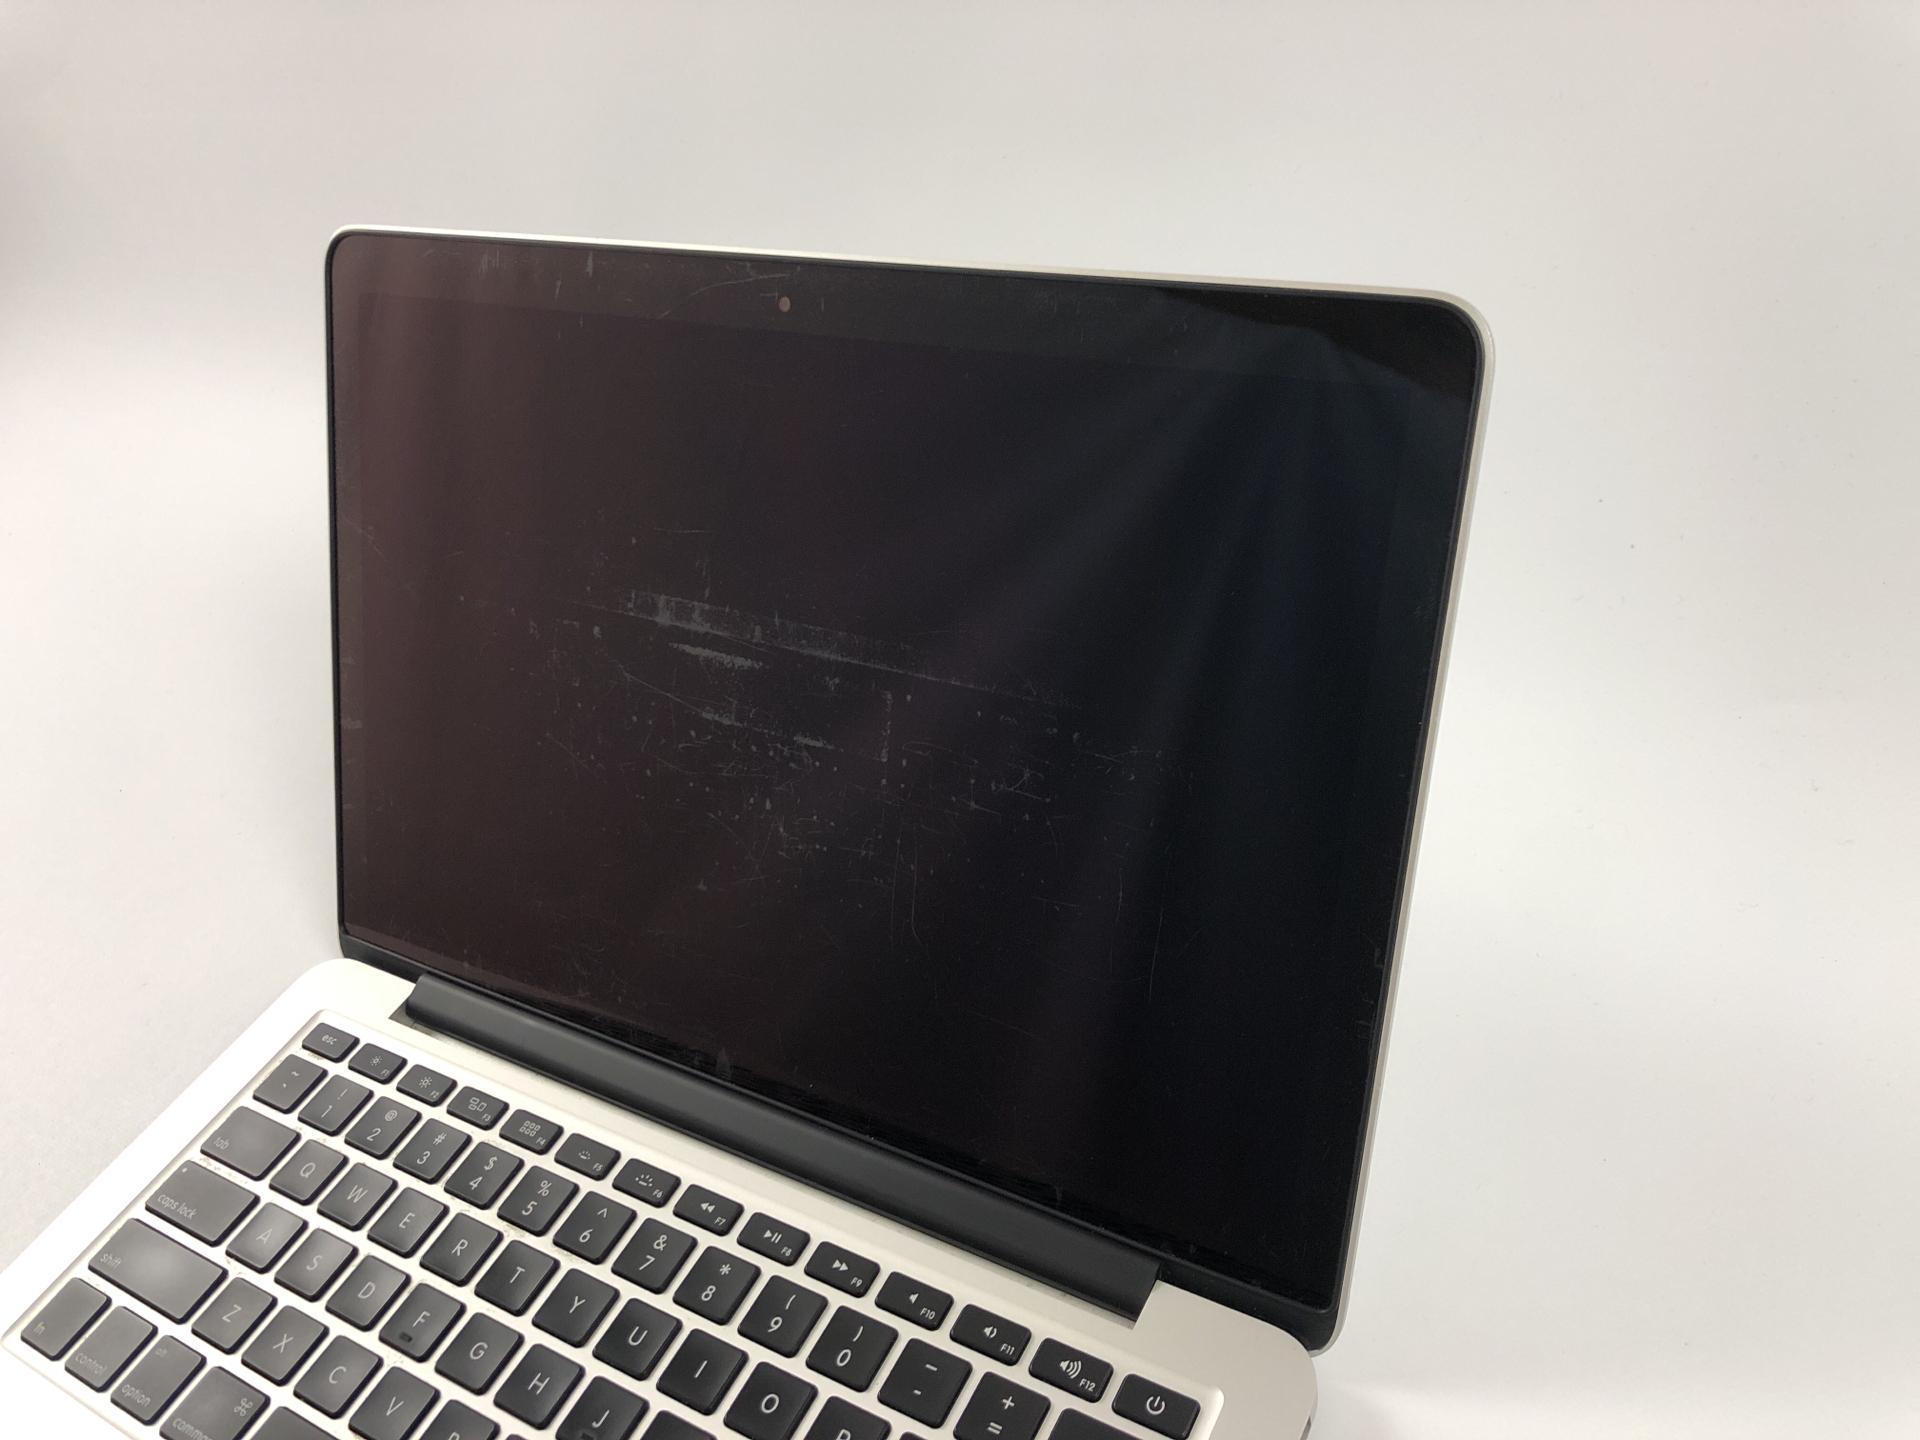 "MacBook Pro Retina 13"" Early 2015 (Intel Core i5 2.9 GHz 16 GB RAM 512 GB SSD), Intel Core i5 2.9 GHz, 16 GB RAM, 512 GB SSD, Kuva 2"